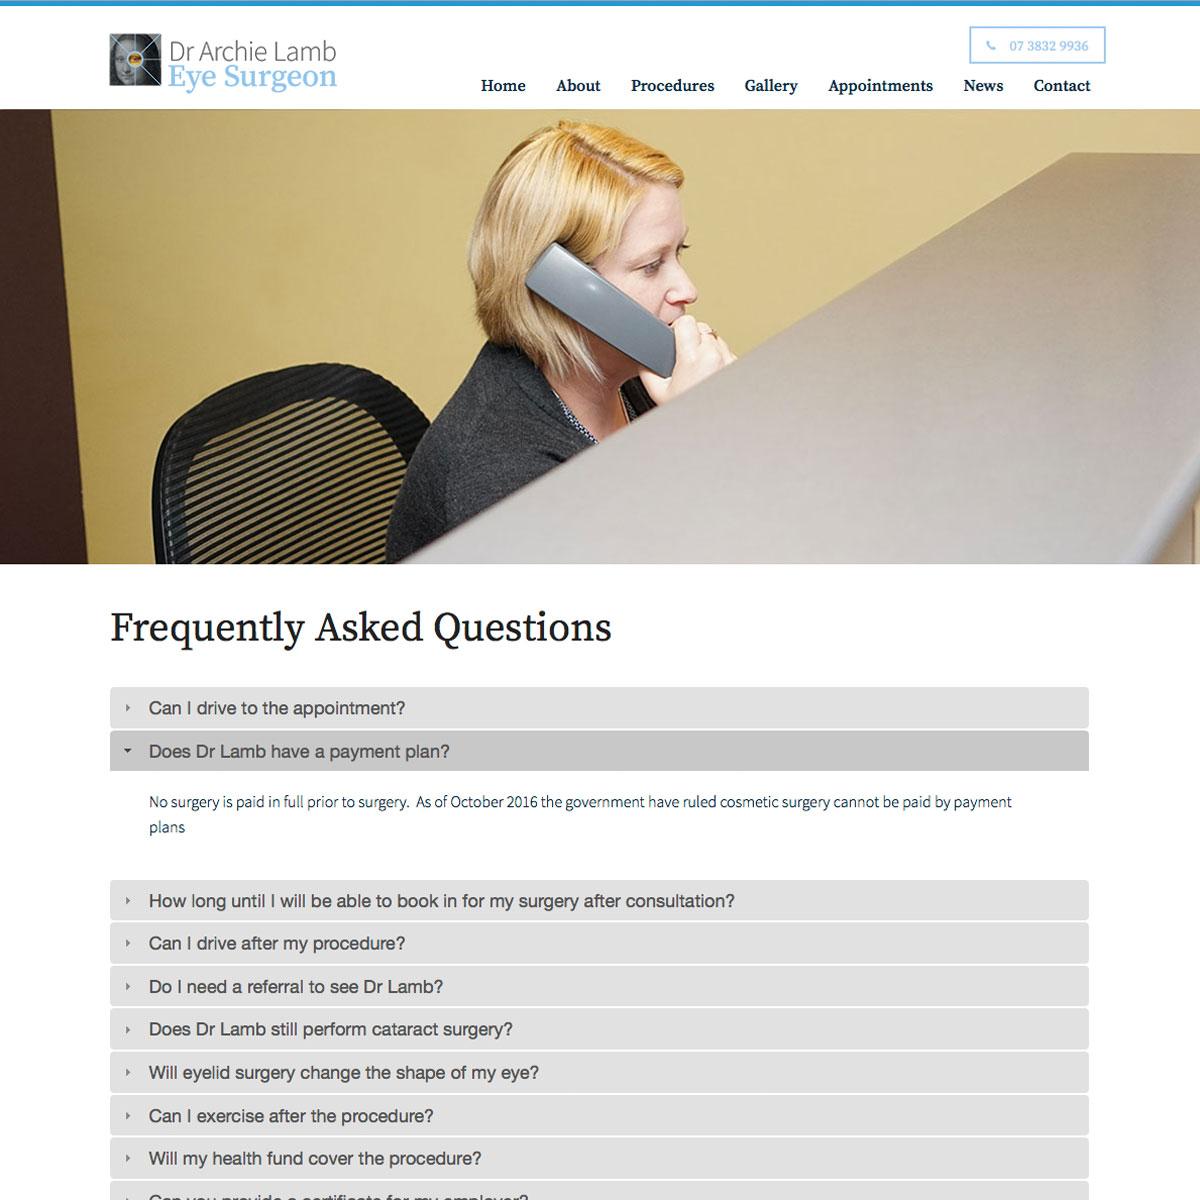 Dr Archie Lamb - FAQ